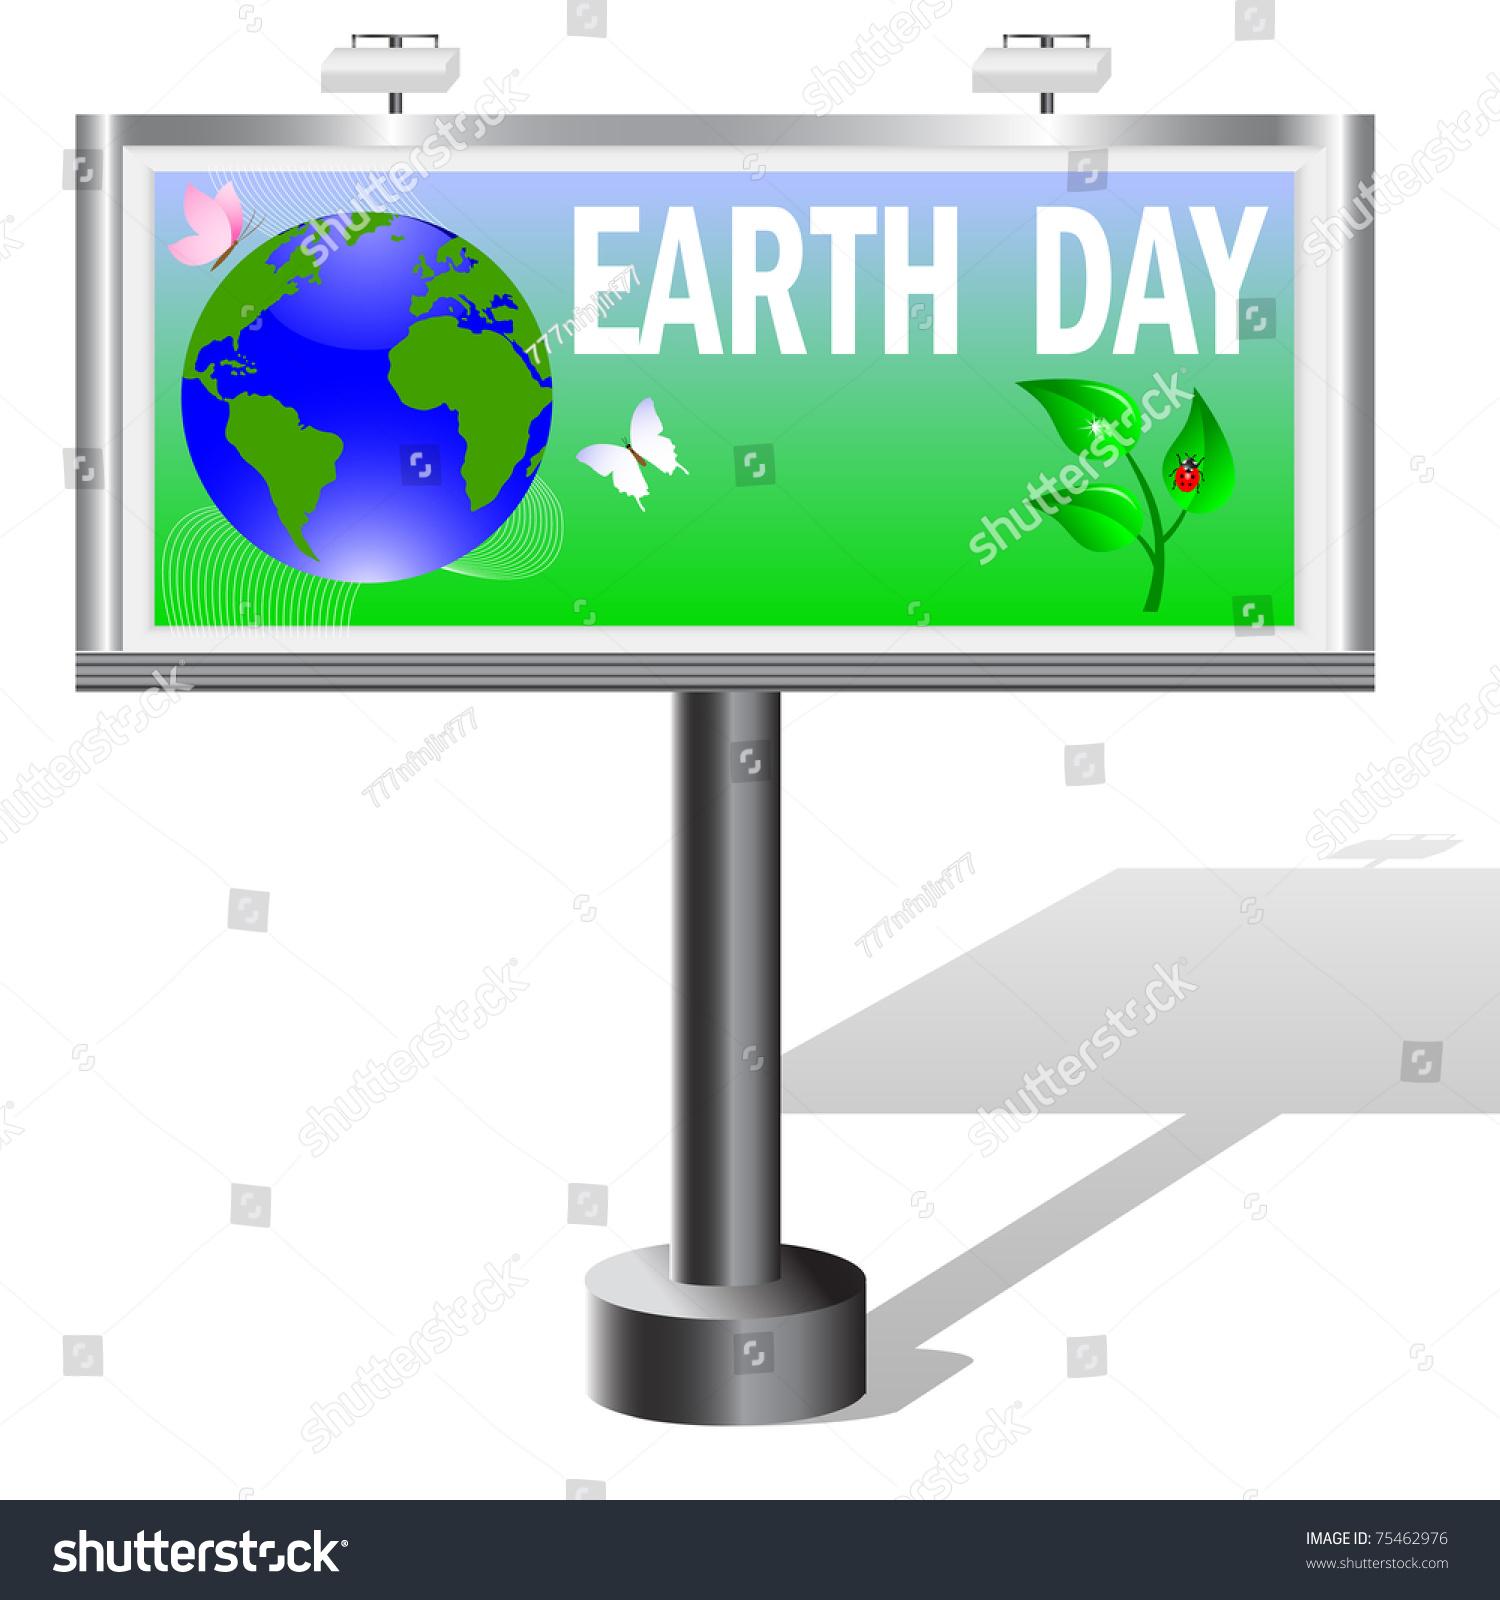 Billboard planet symbol on earth day stock illustration 75462976 billboard planet symbol on earth day stock illustration 75462976 shutterstock buycottarizona